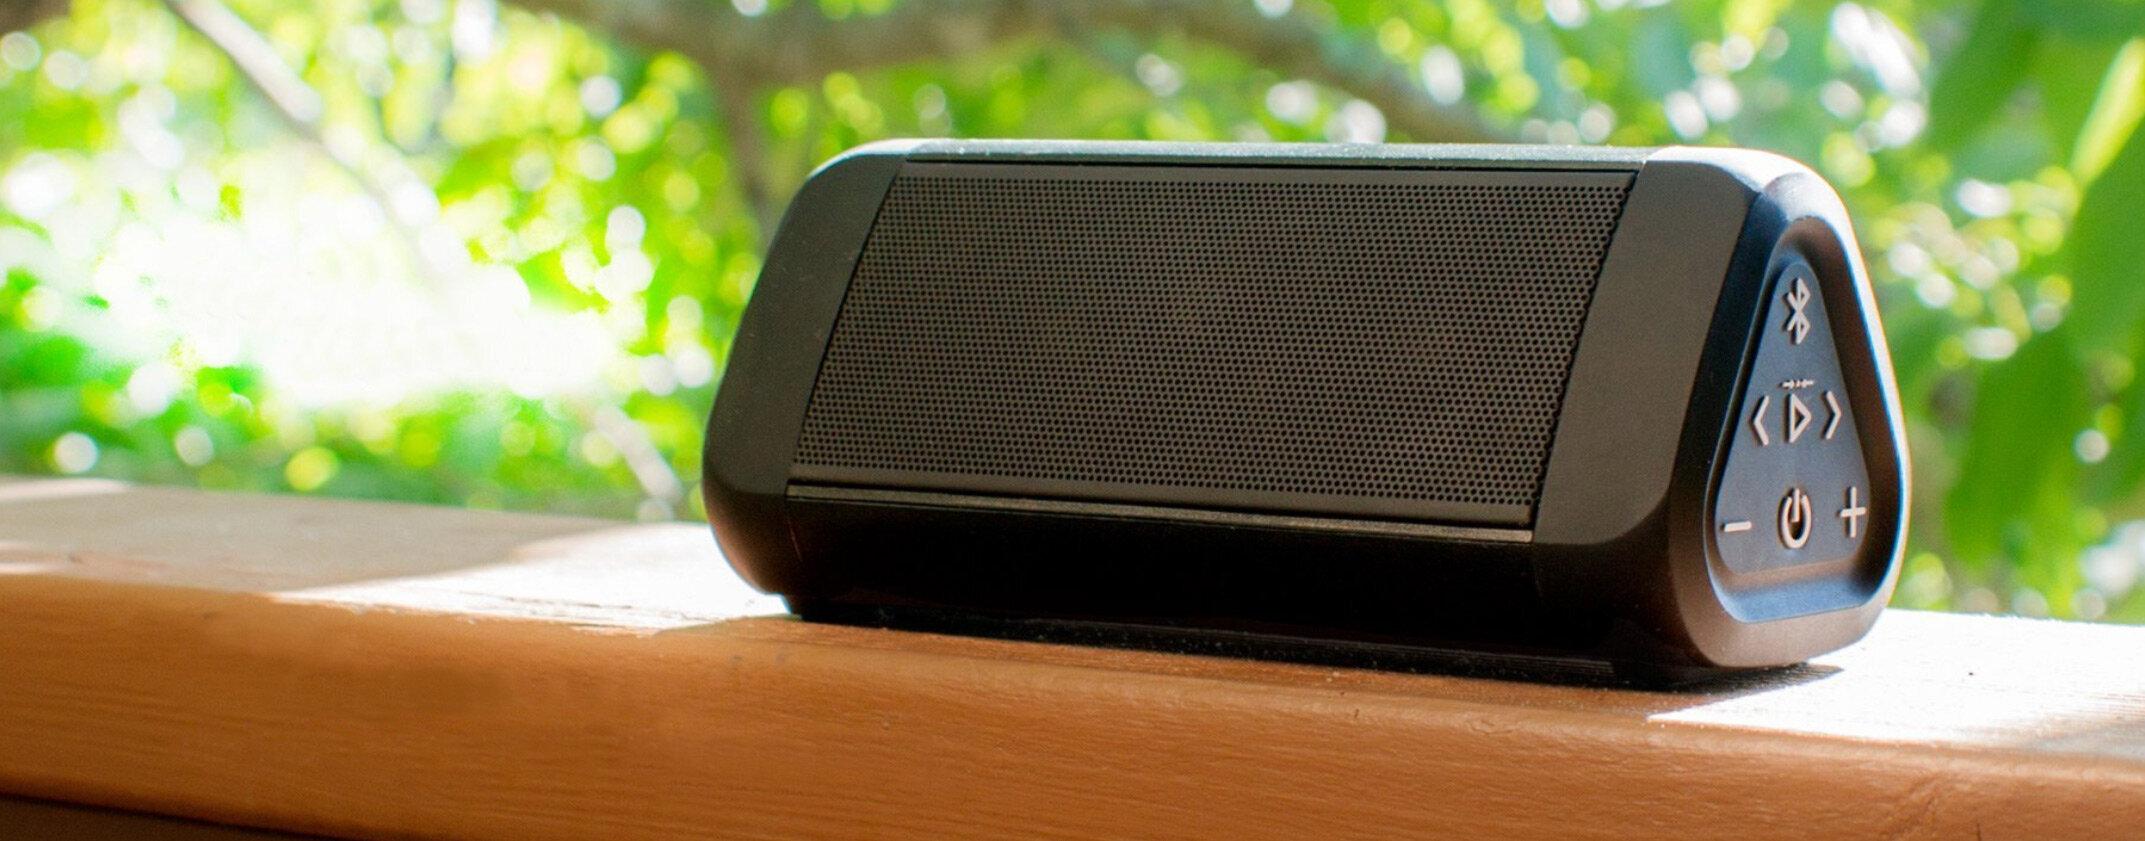 OontZ Angle 3 ULTRA Portable Wireless Bluetooth Speaker — OontZ